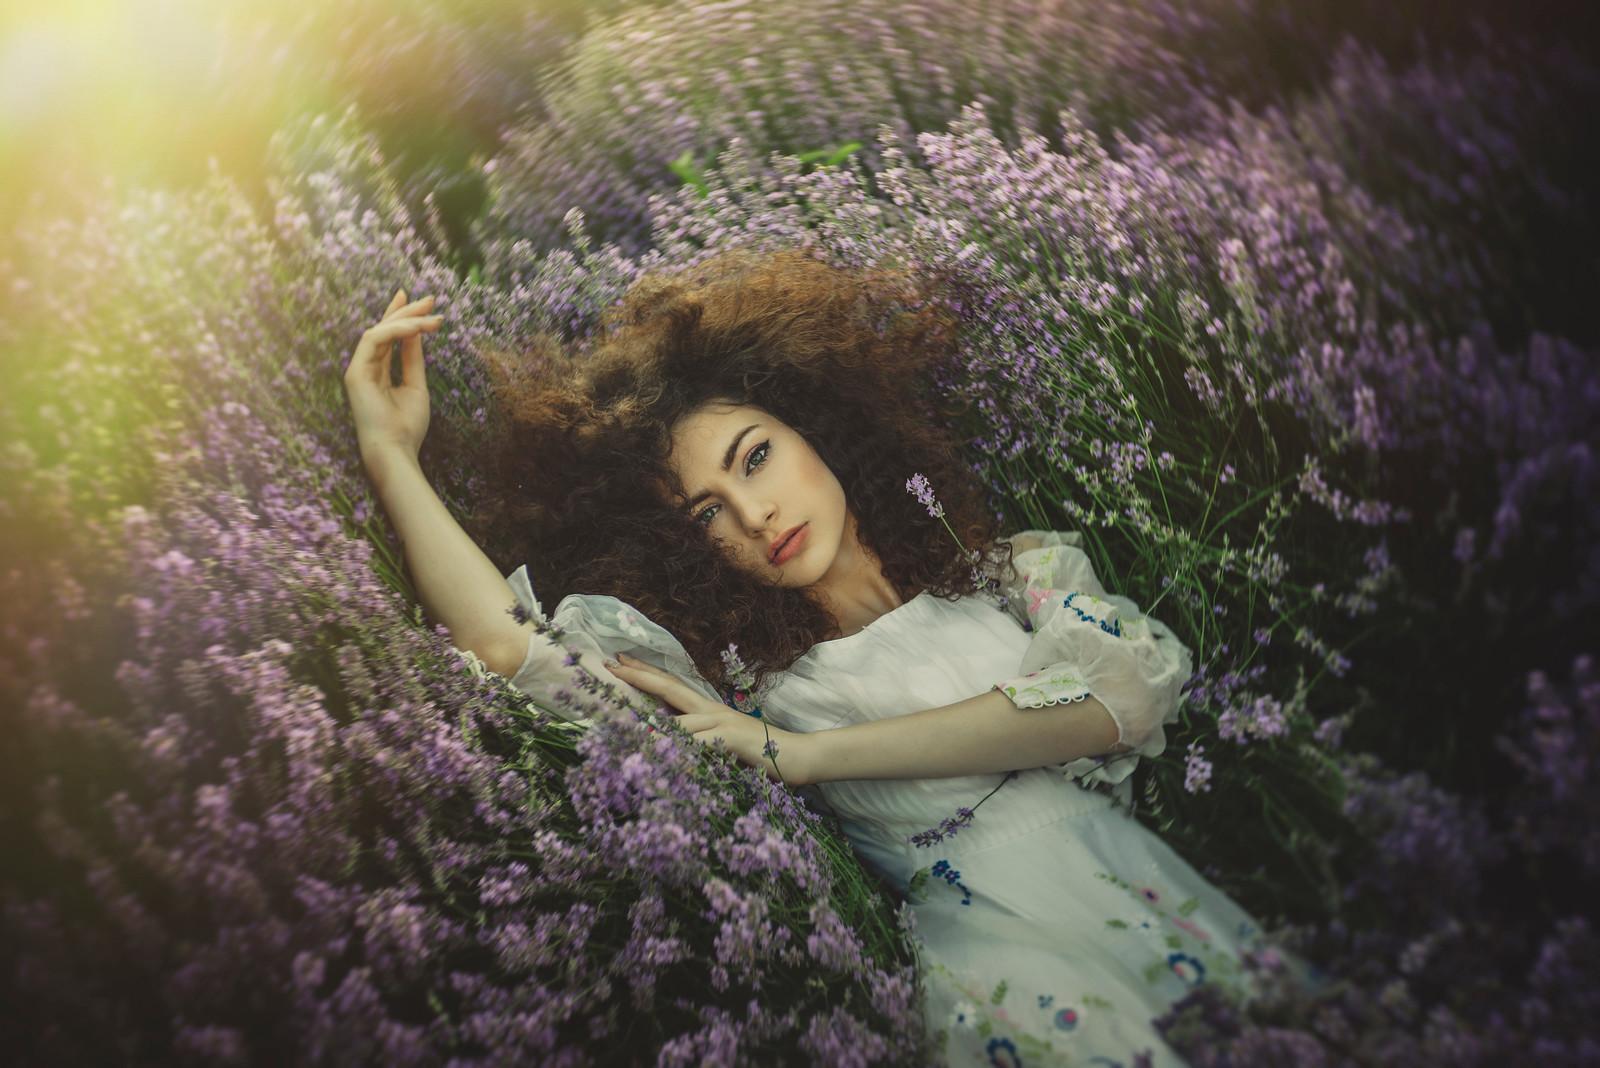 lavender in a dream